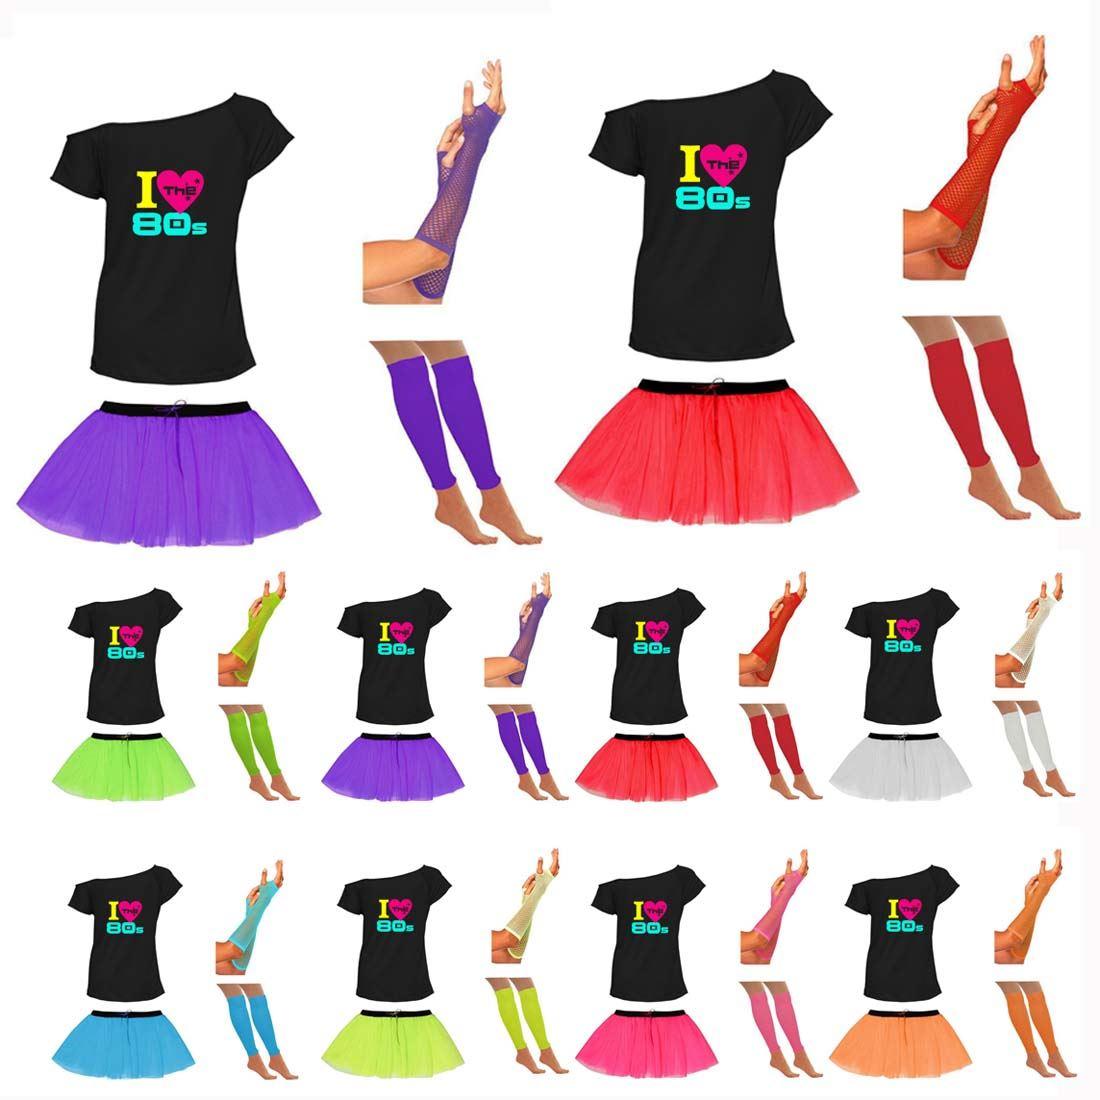 Womens I Love 80s Tutu Skirt Off Shoulder T Shirt Gloves Legwarmer Madonna Set